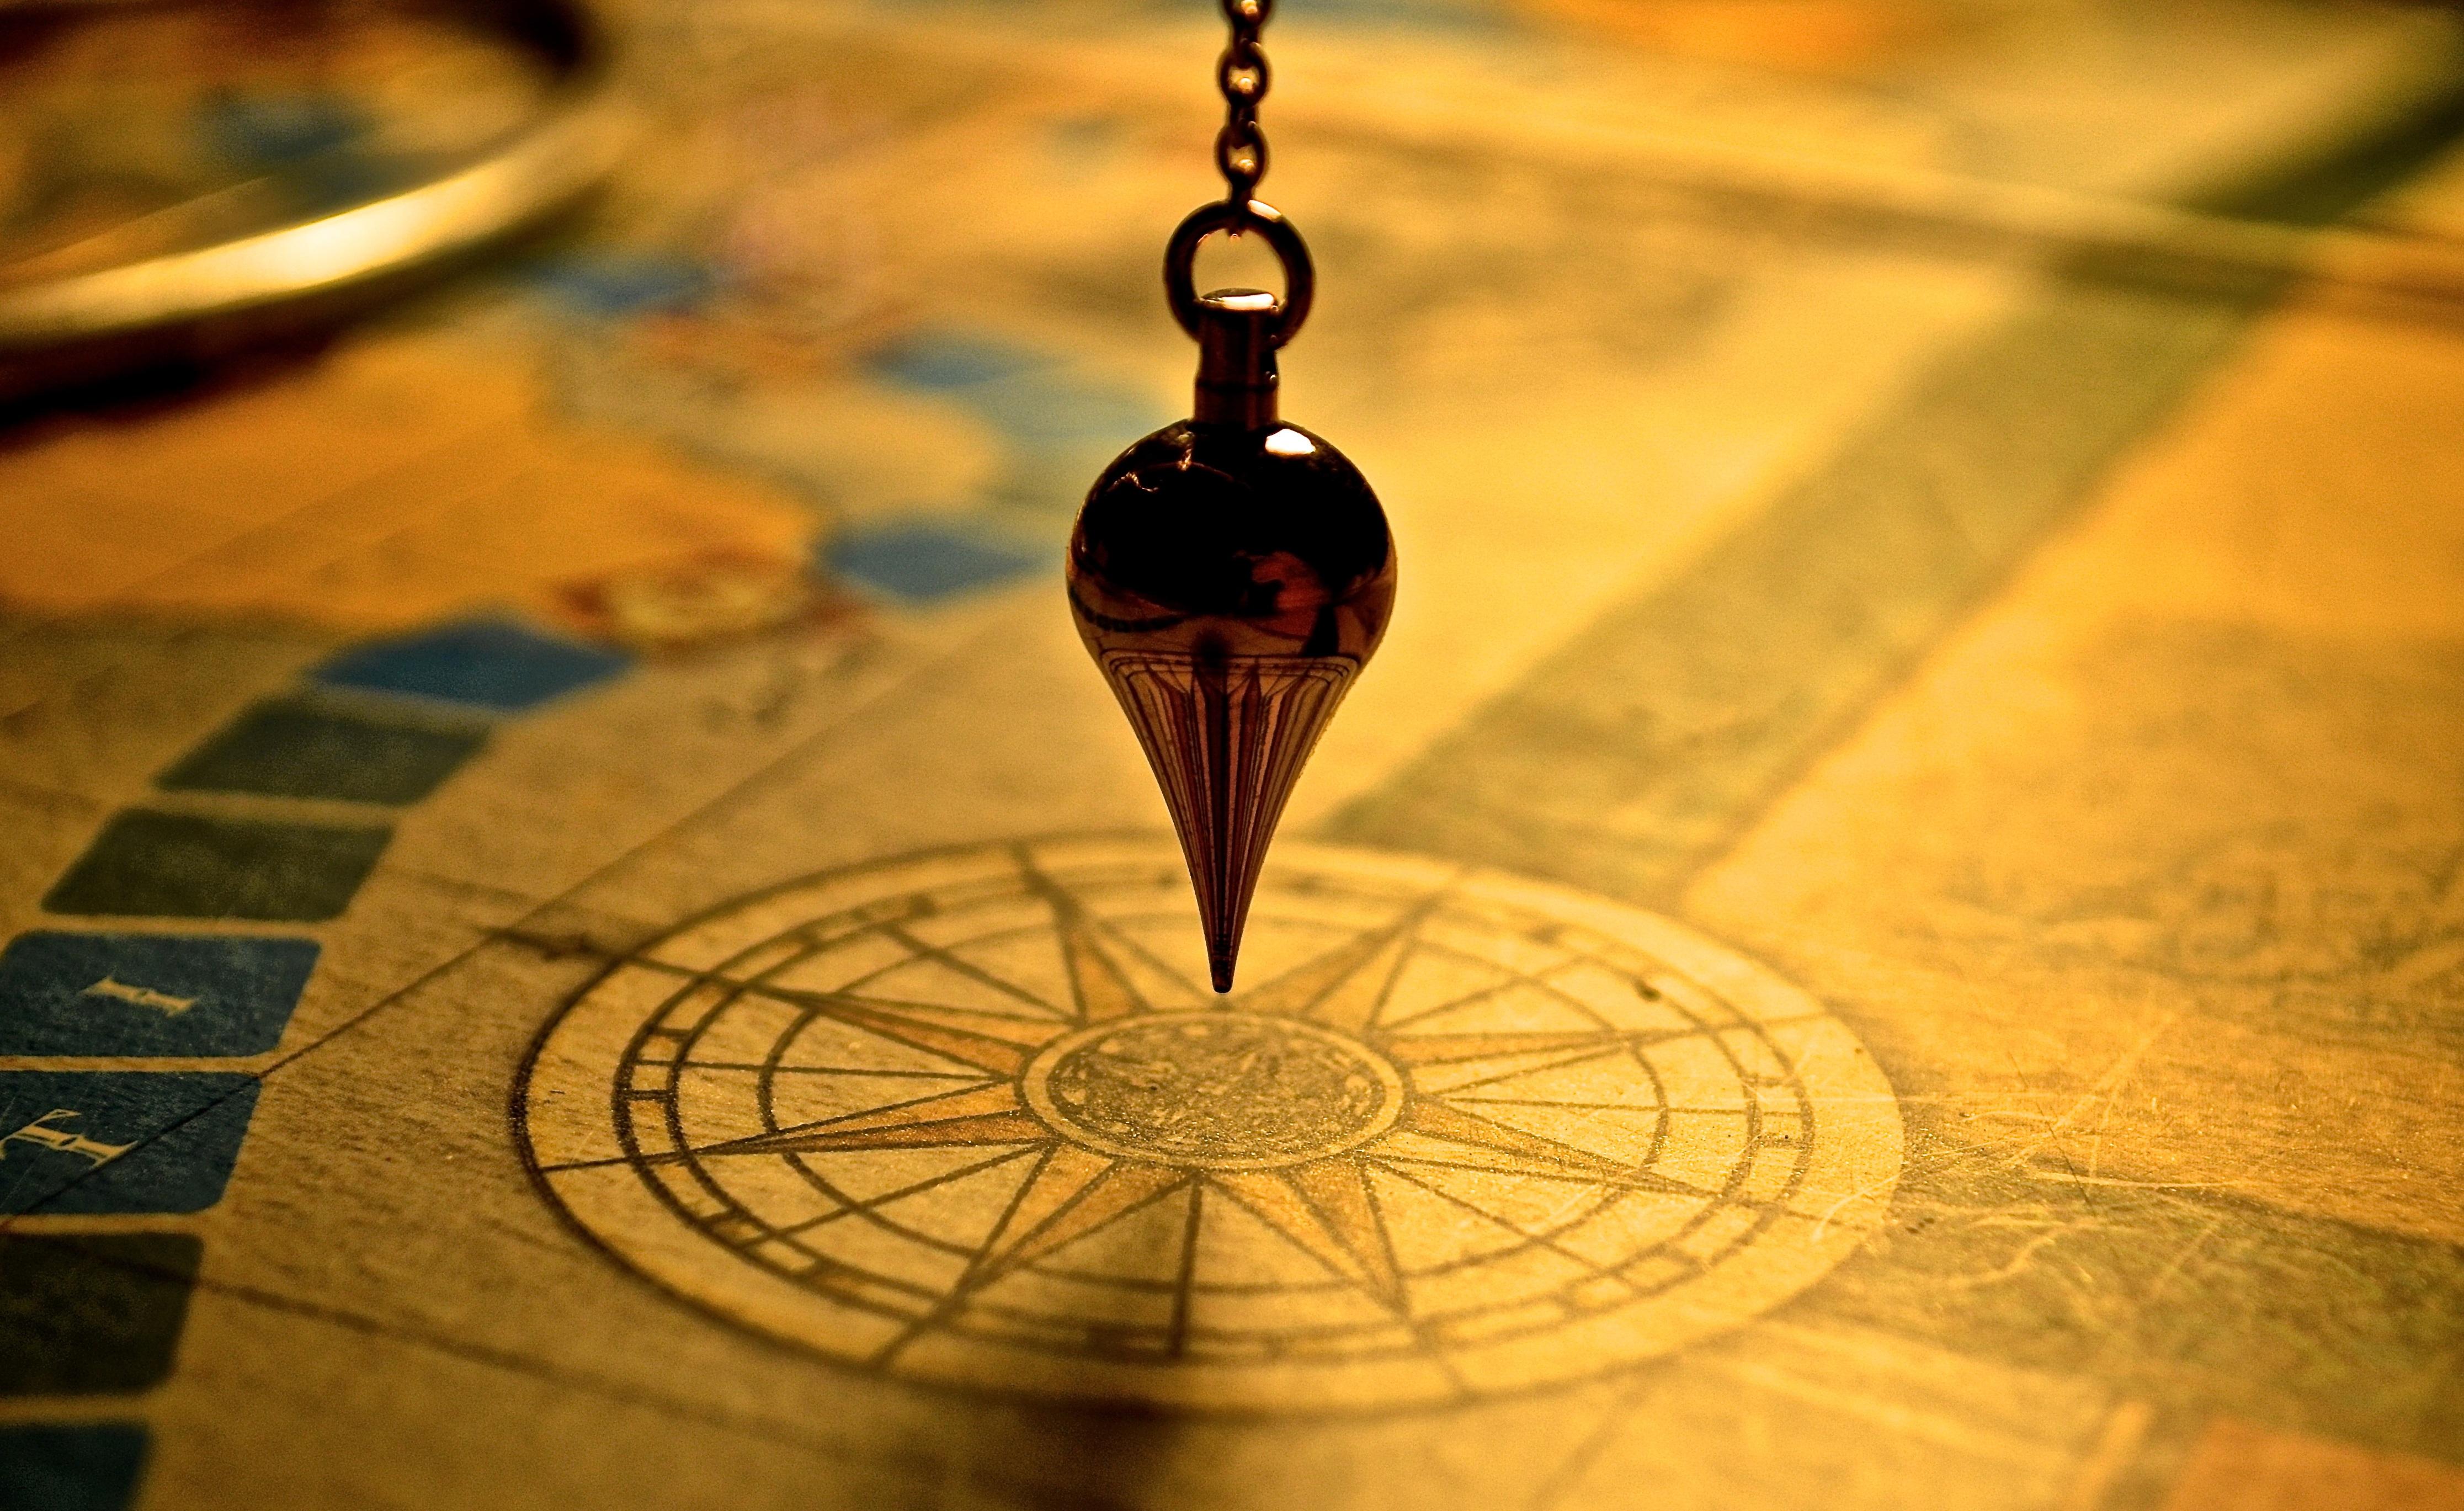 Gratis Afbeeldingen : pad, blad, glas, kleur, kompas, geel ...